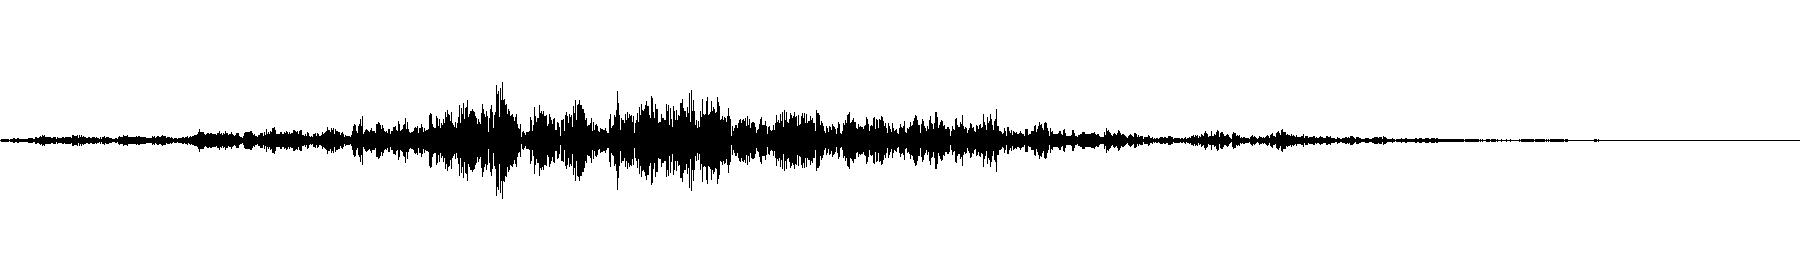 bassy drums suspense